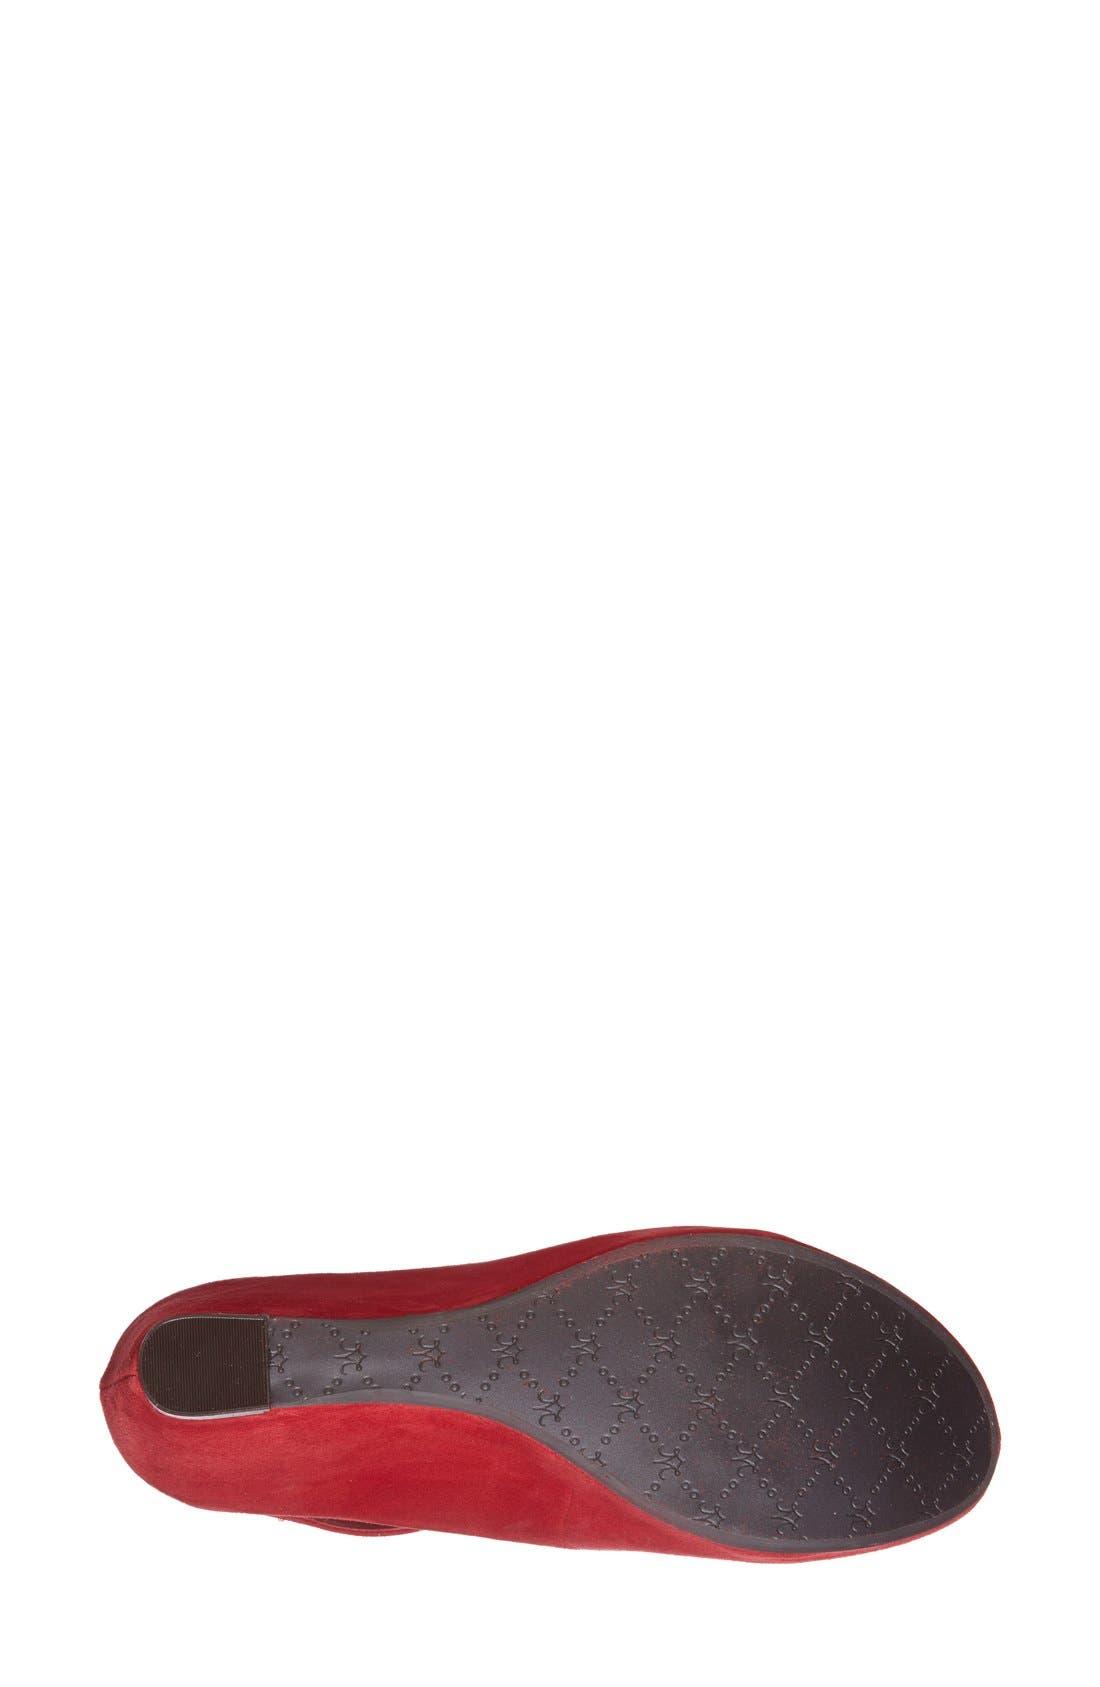 'Tricia' Ankle Strap Sandal,                             Alternate thumbnail 59, color,